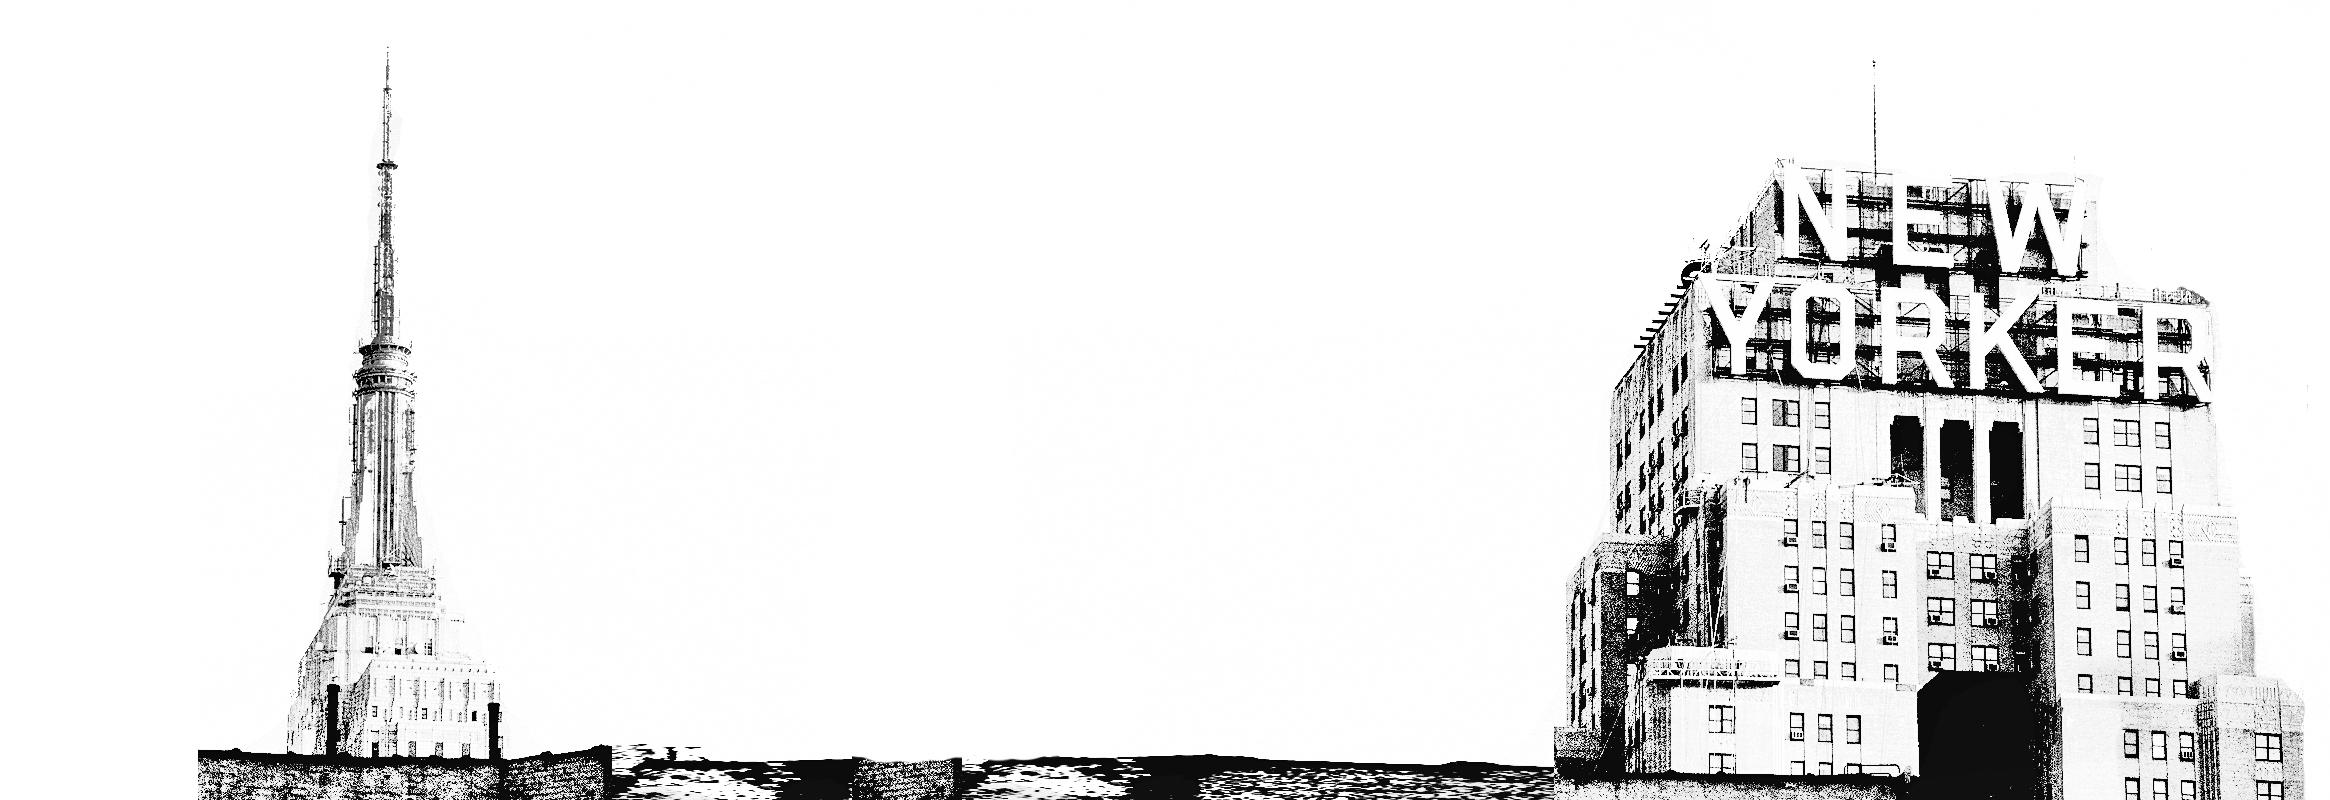 nyc background 2.jpg